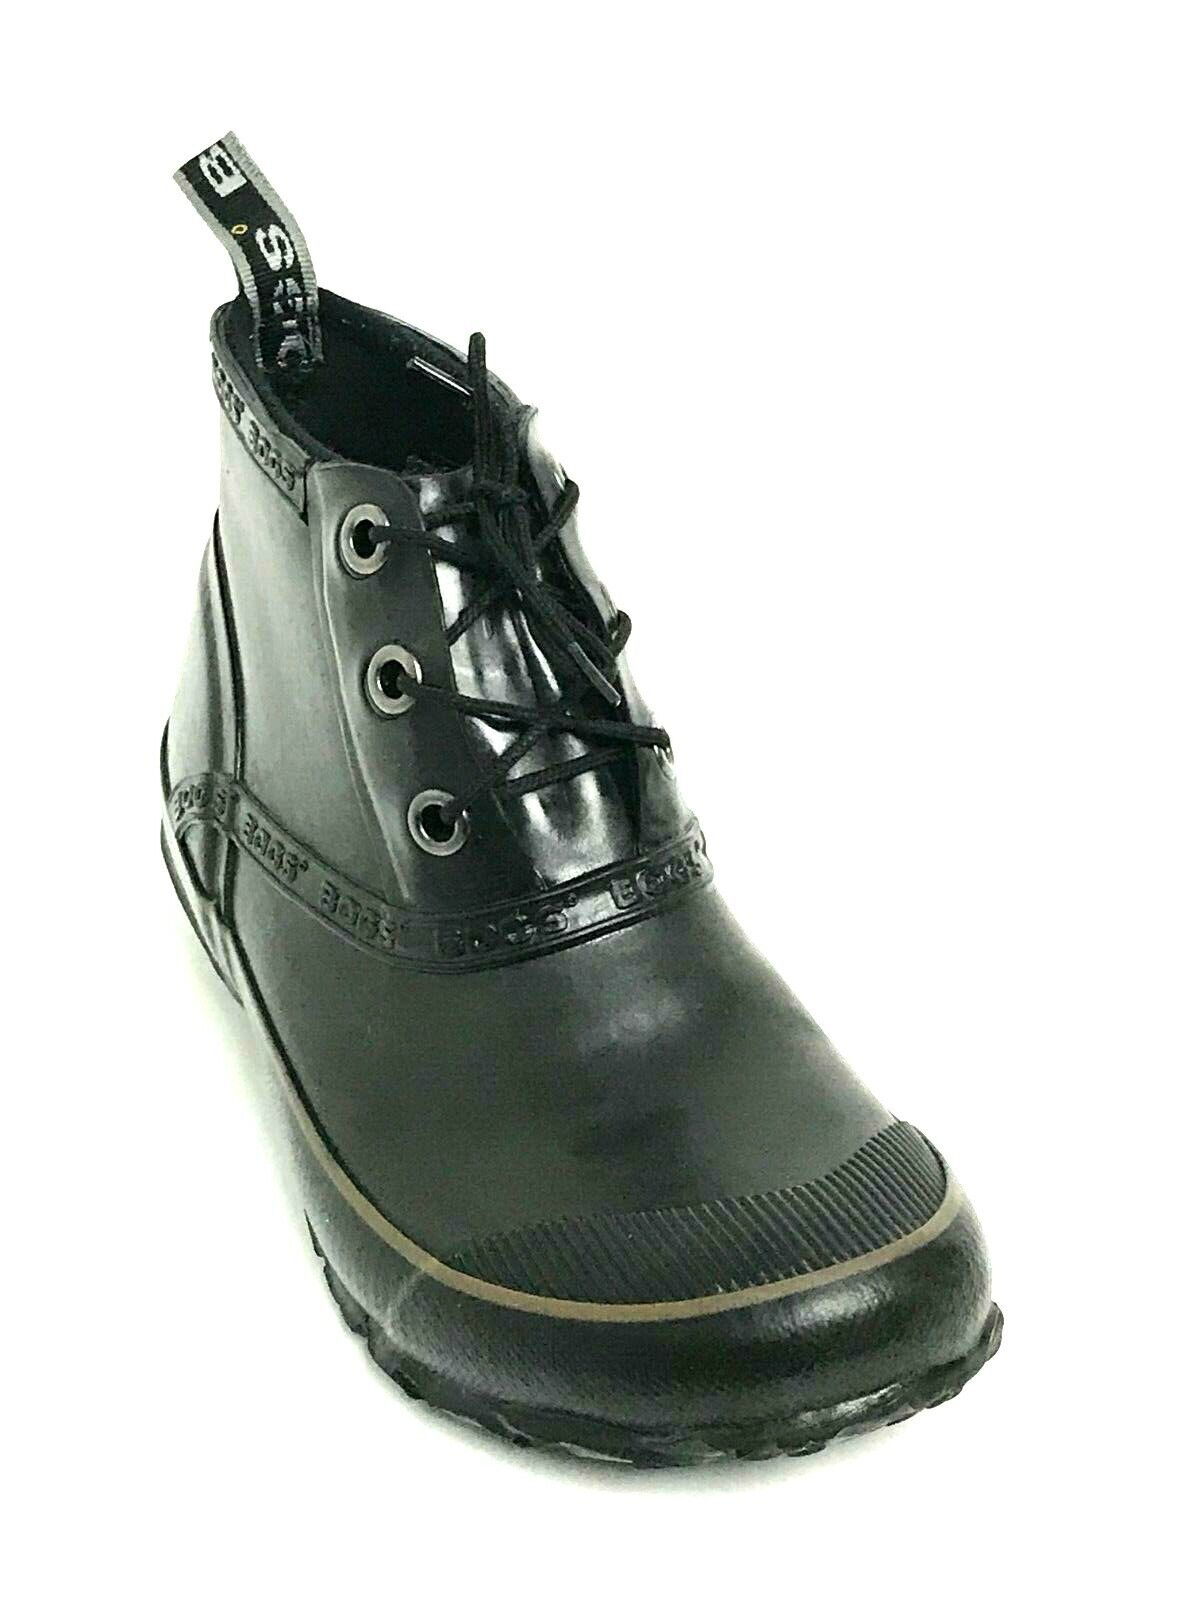 Bogs Charlot Women's Black Boots Size.US.6 EU. 37